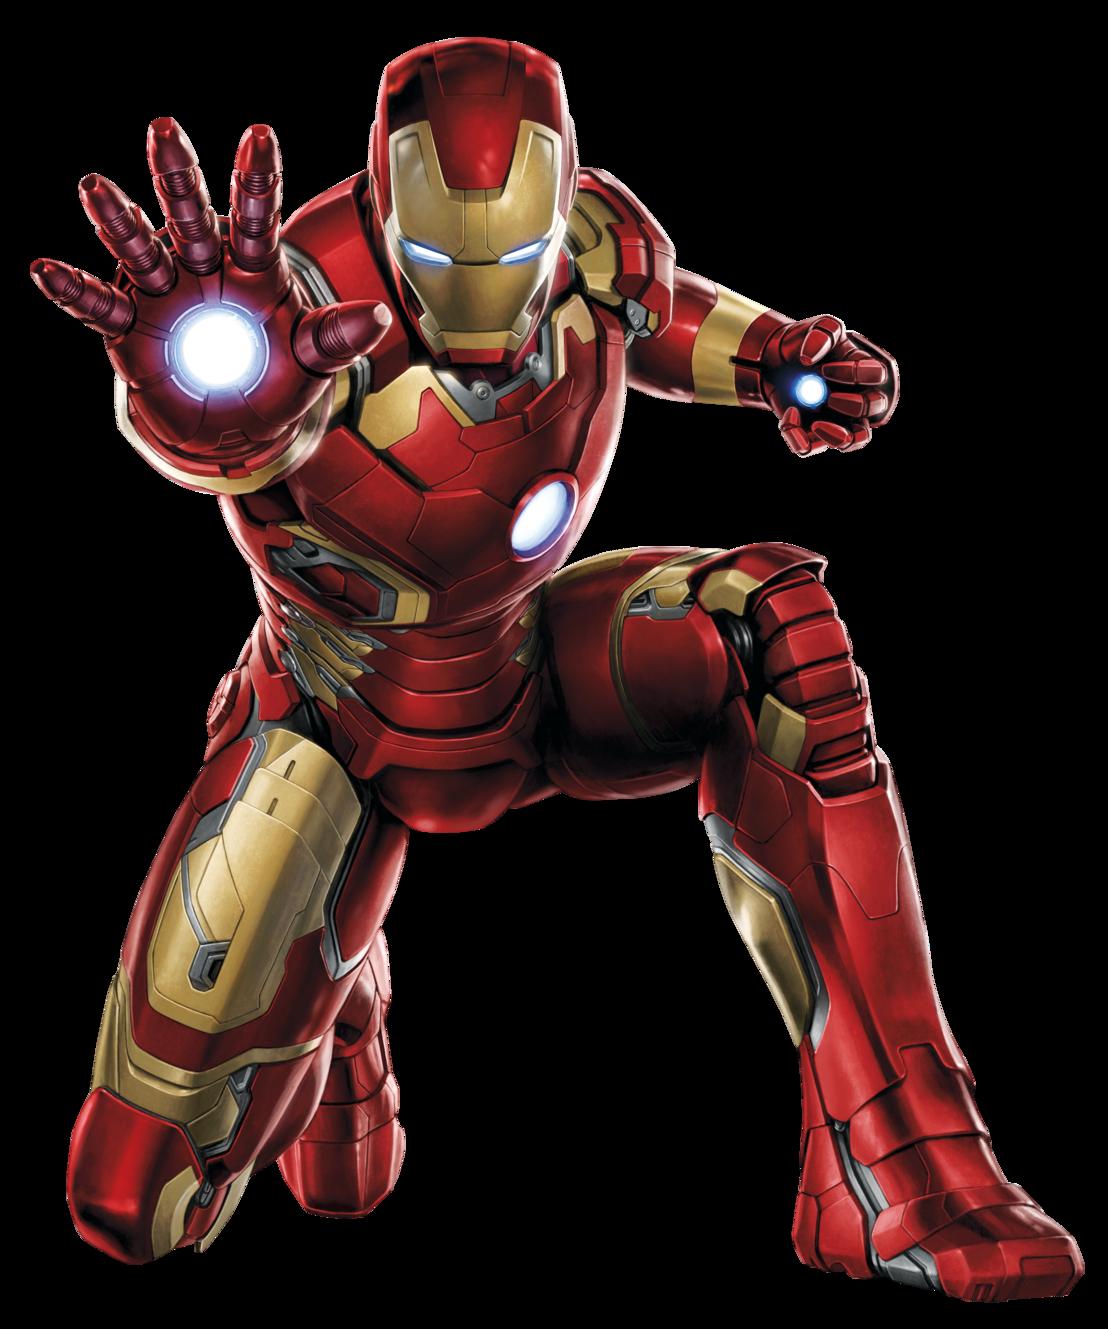 Ironman avengers age ultron